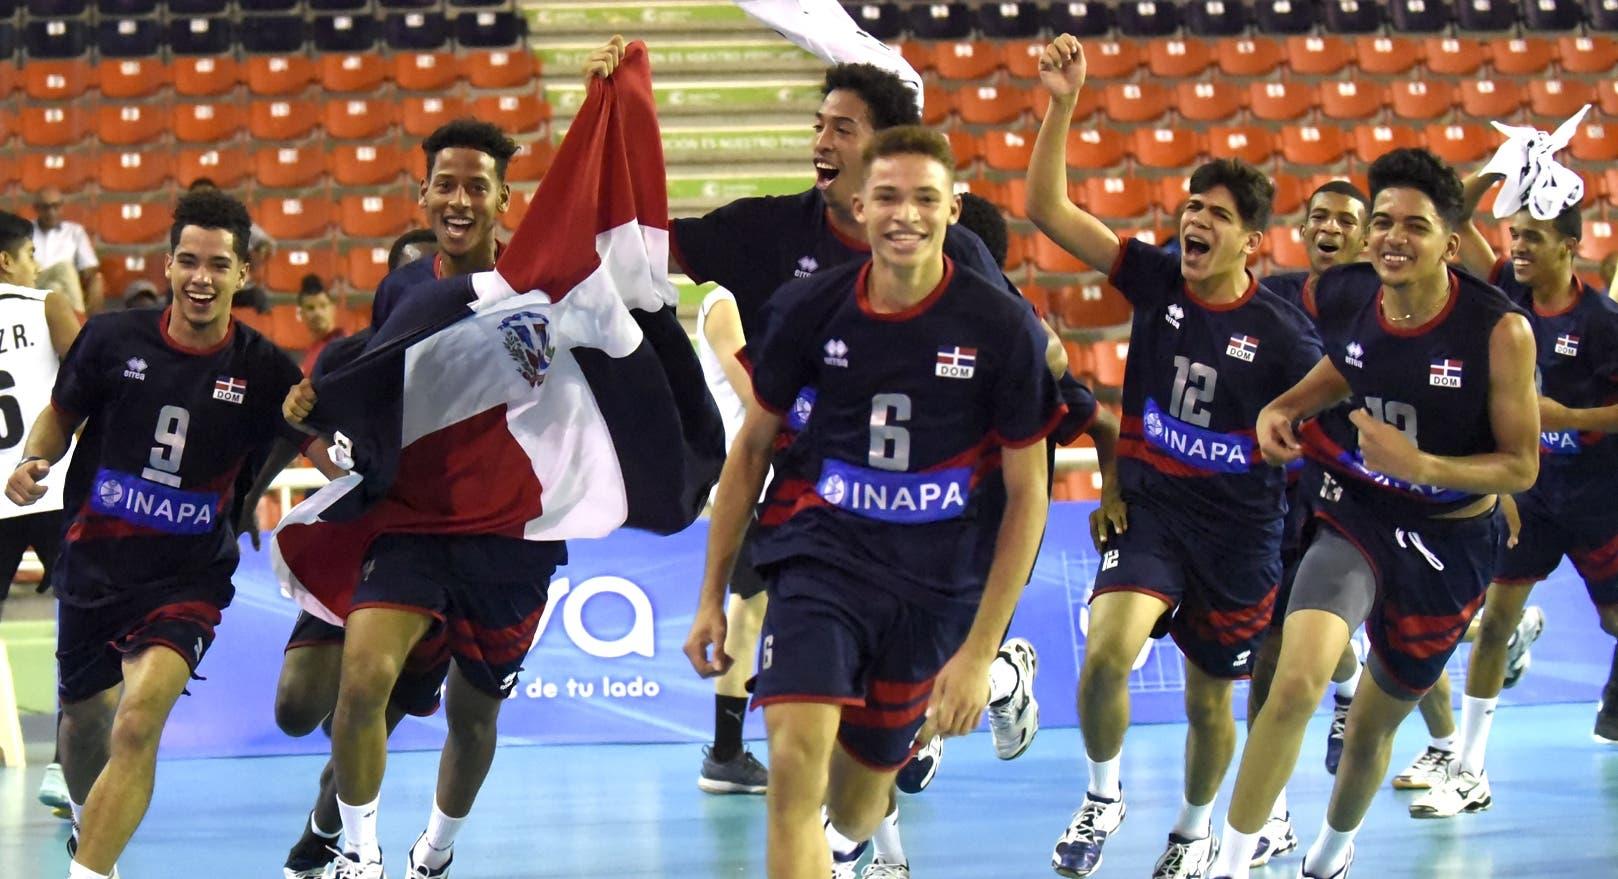 República Dominicana se impone a Chile; clasifica a Mundial de Voleibol